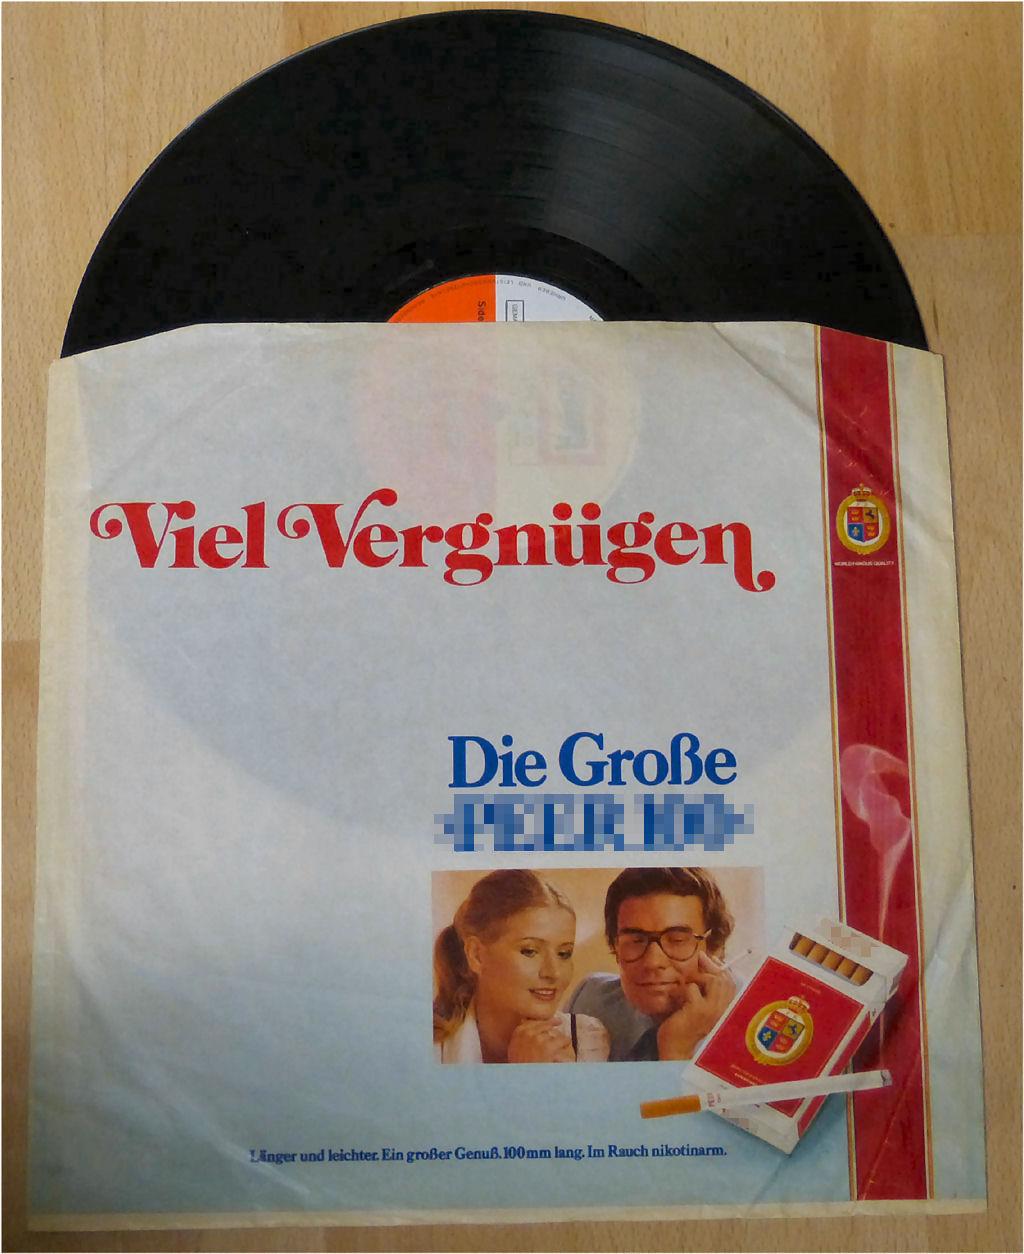 Schallplatten Zigaretten Werbung